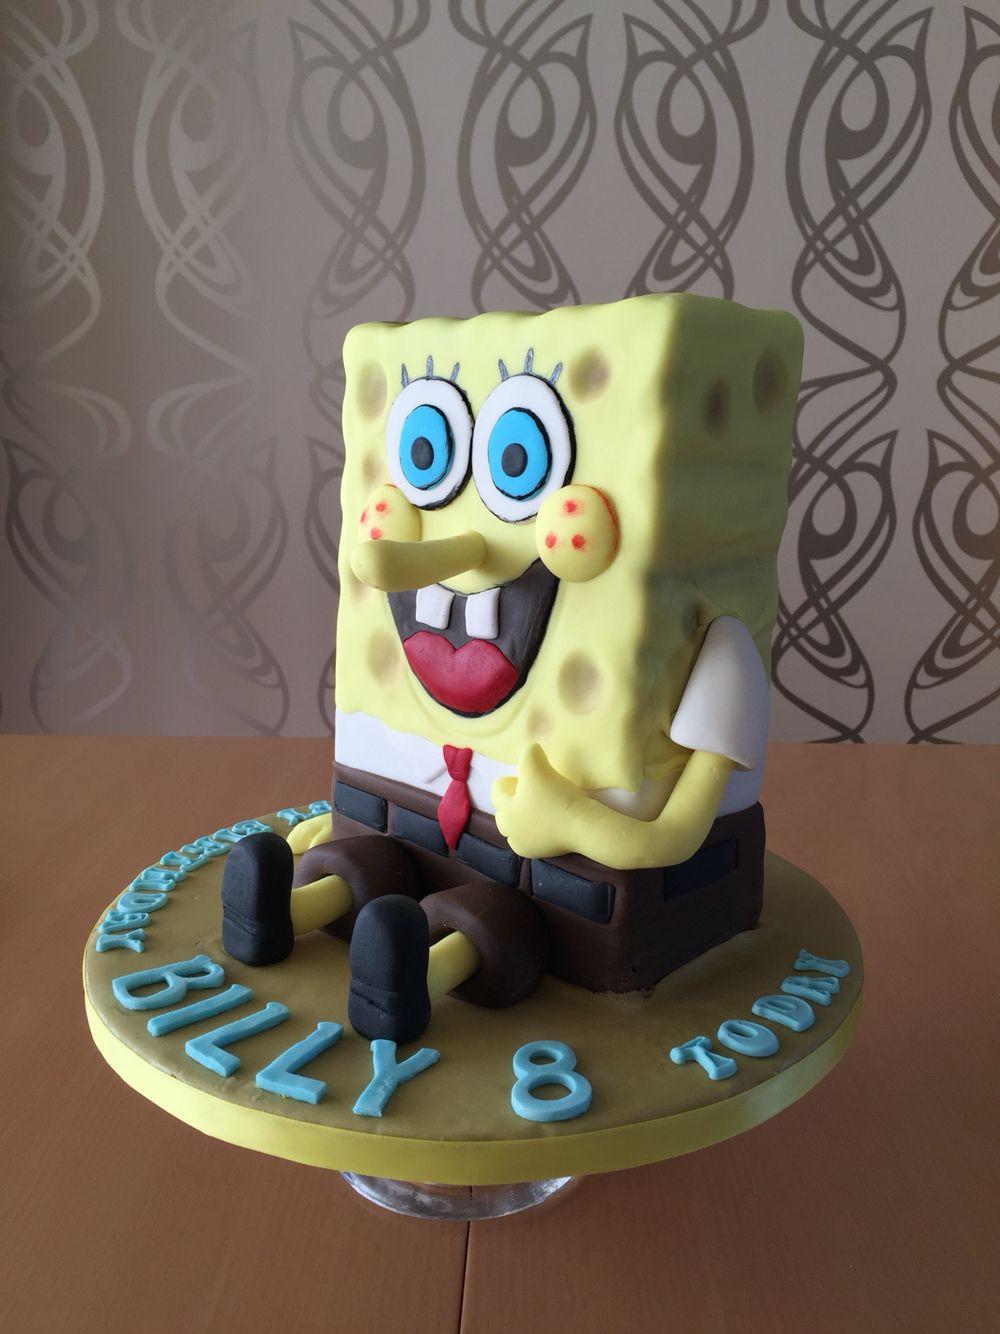 Spongebob Cake My Cakes Cake Birthday Cake Spongebob